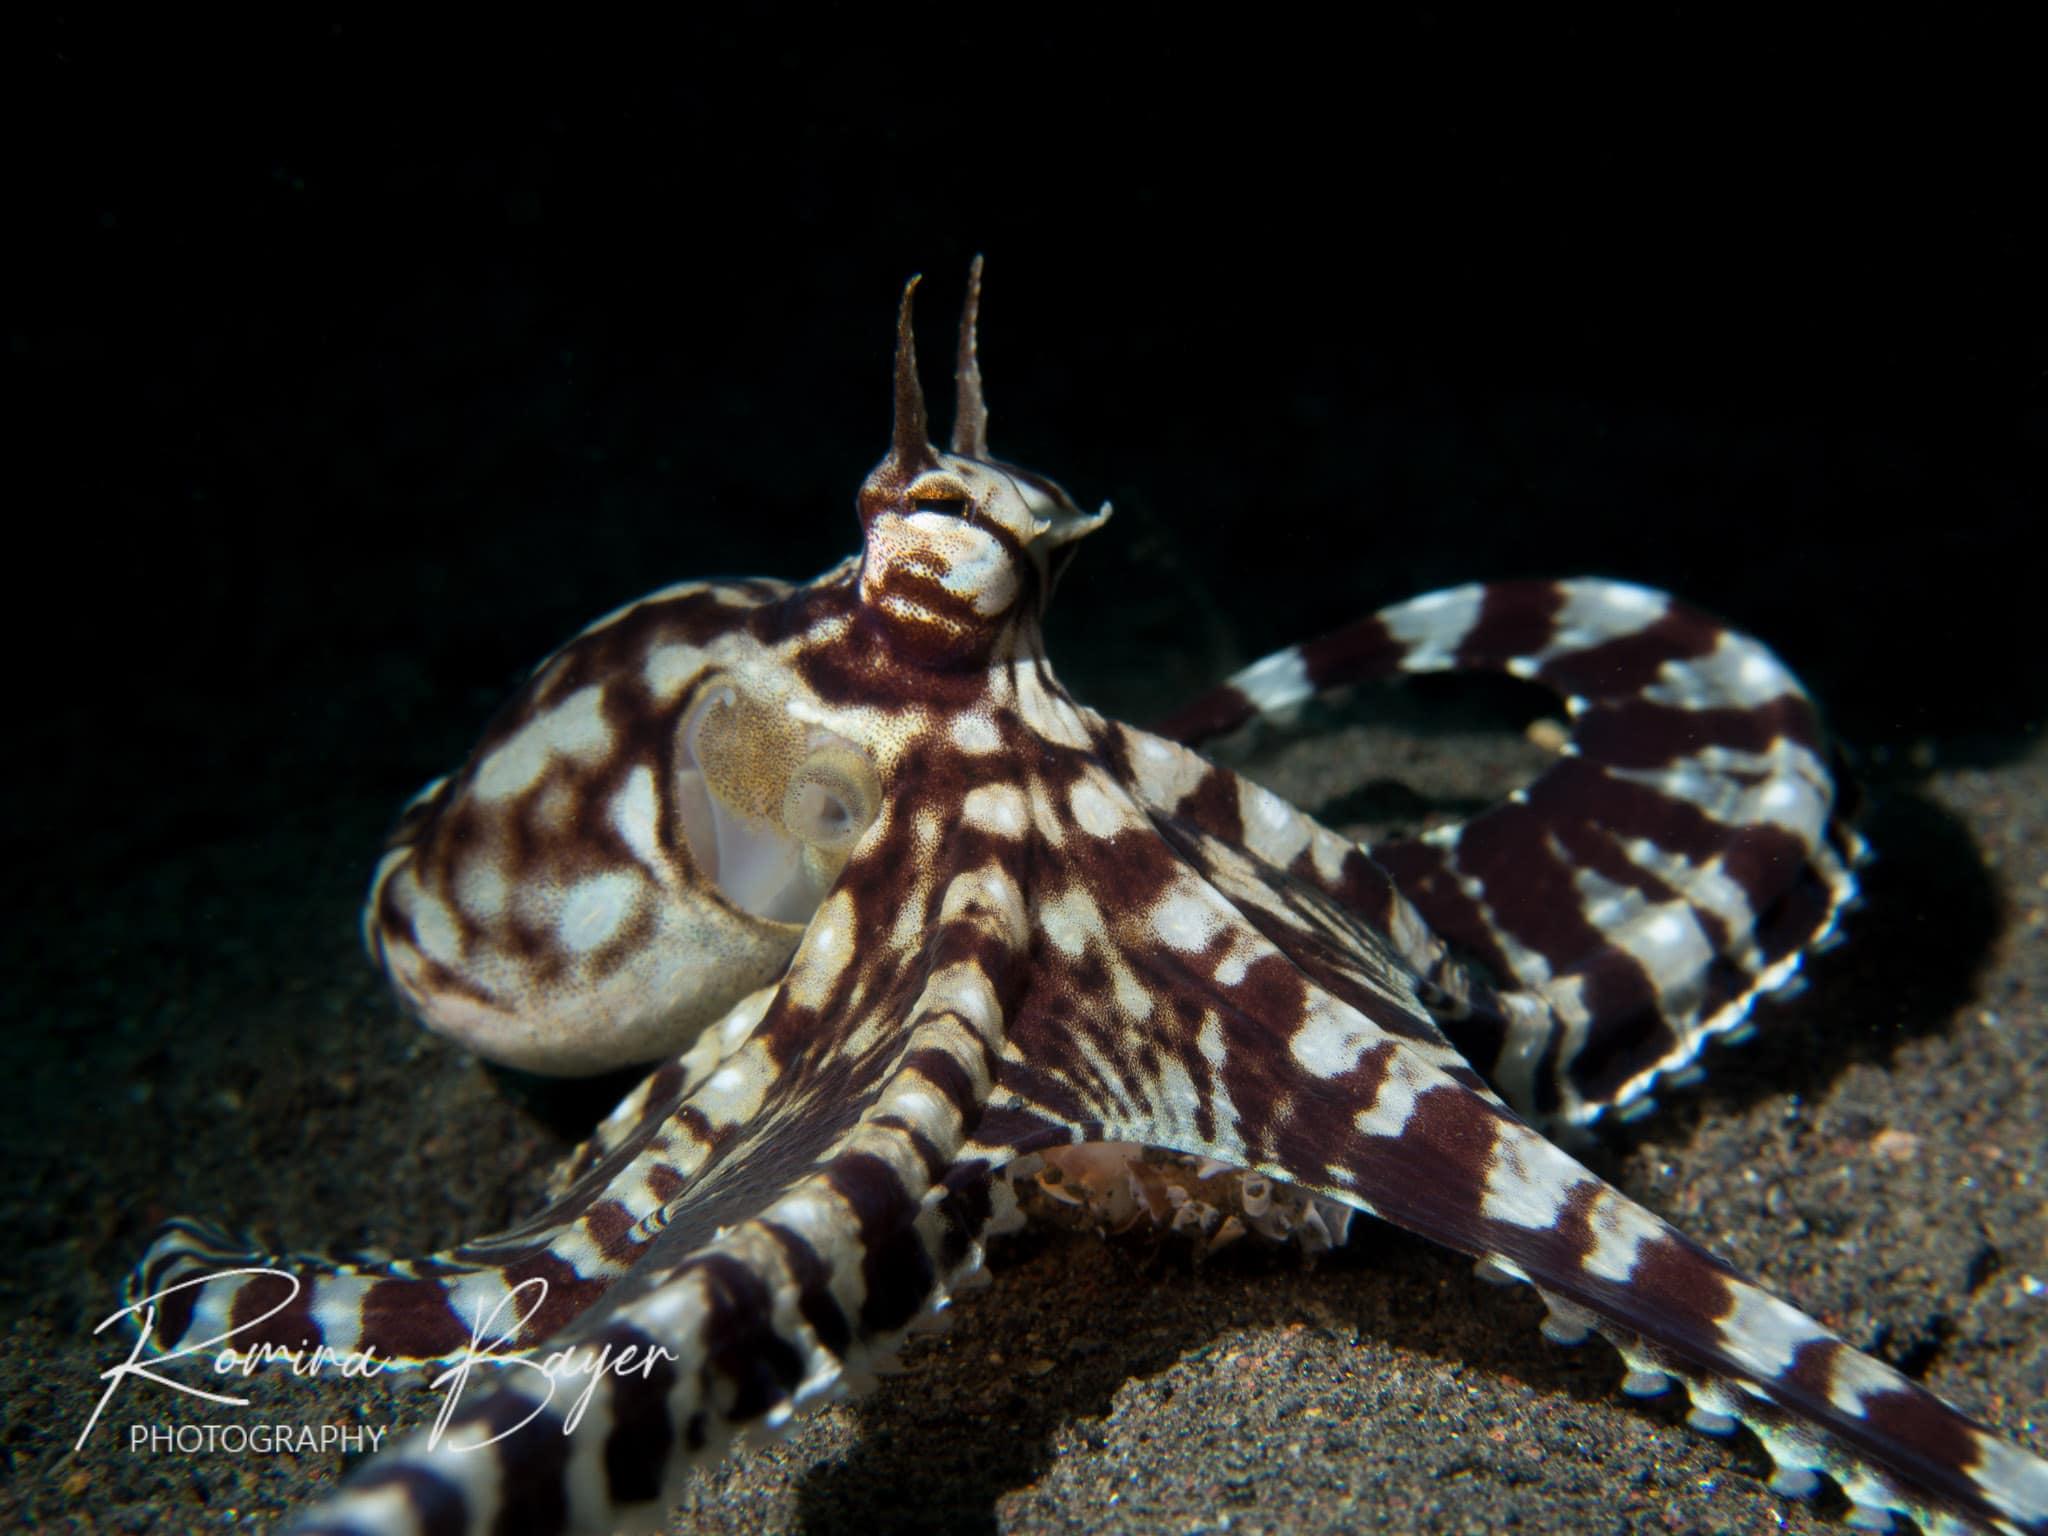 Mimic octopus